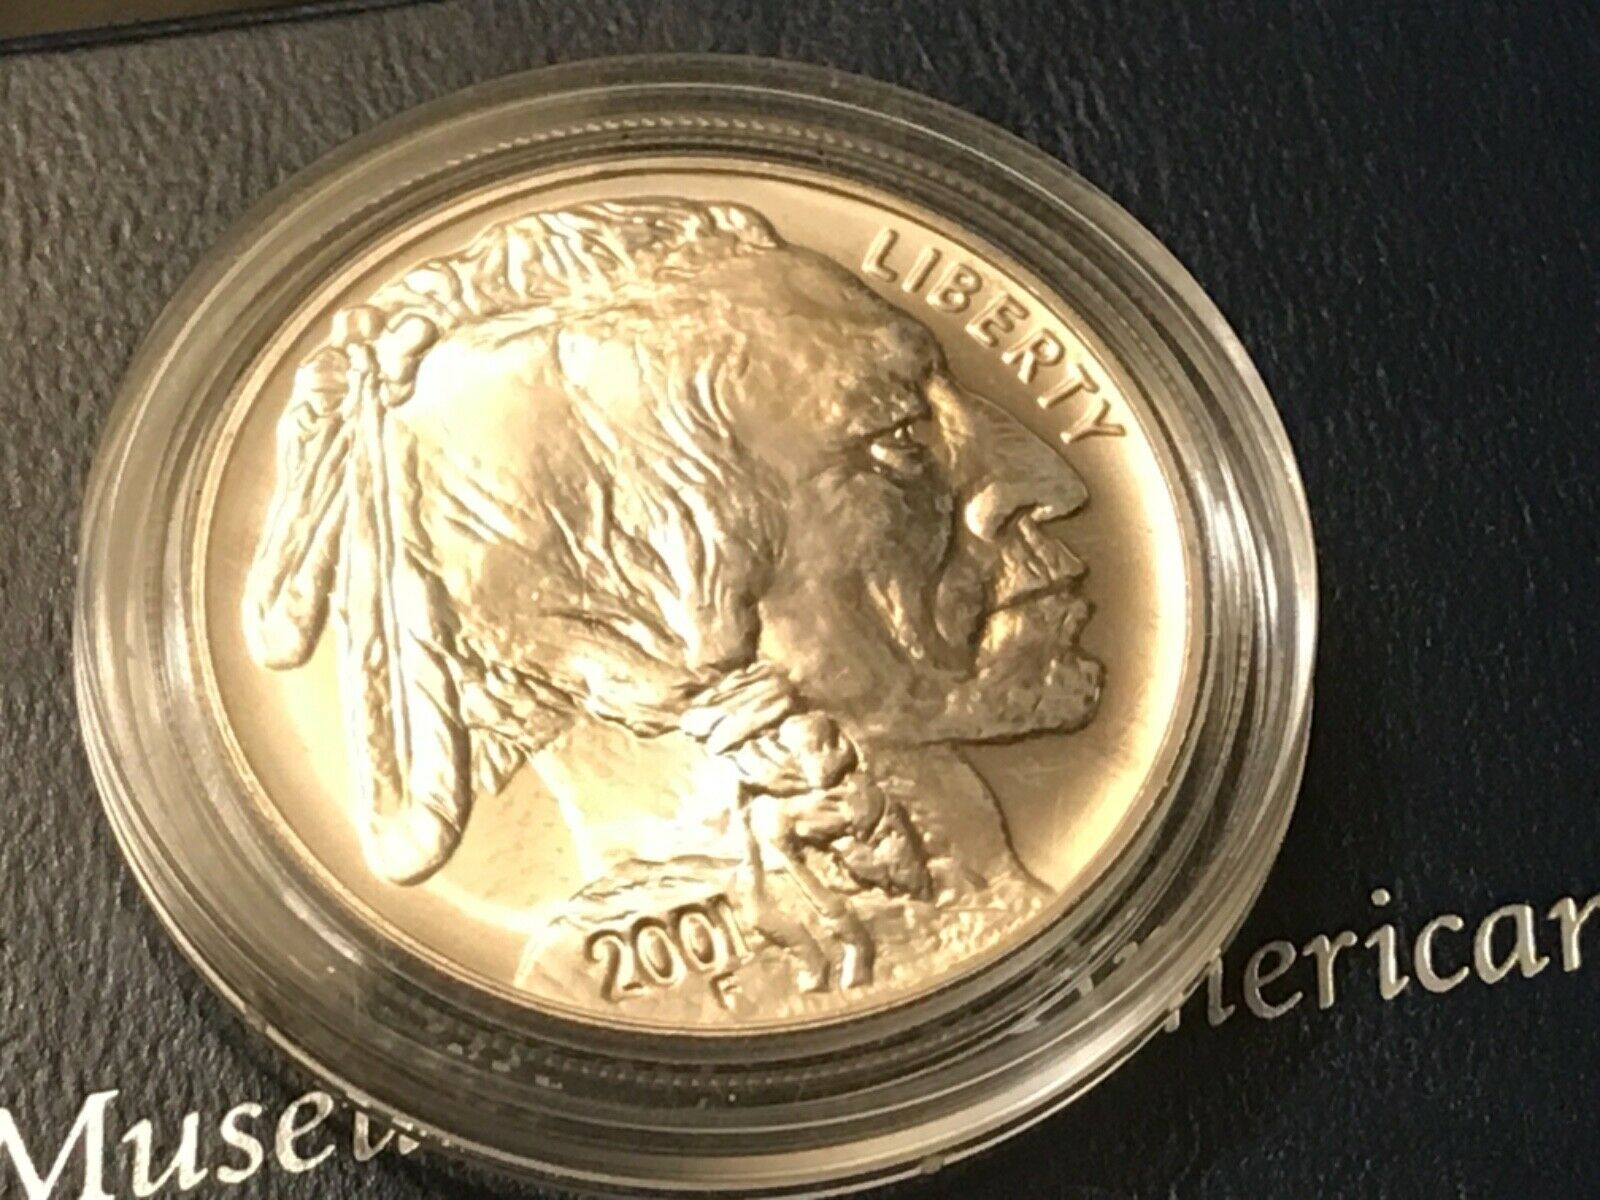 2001 American Buffalo Commemorative Coin, Uncirculated Silver Dollar 7 - $175.00